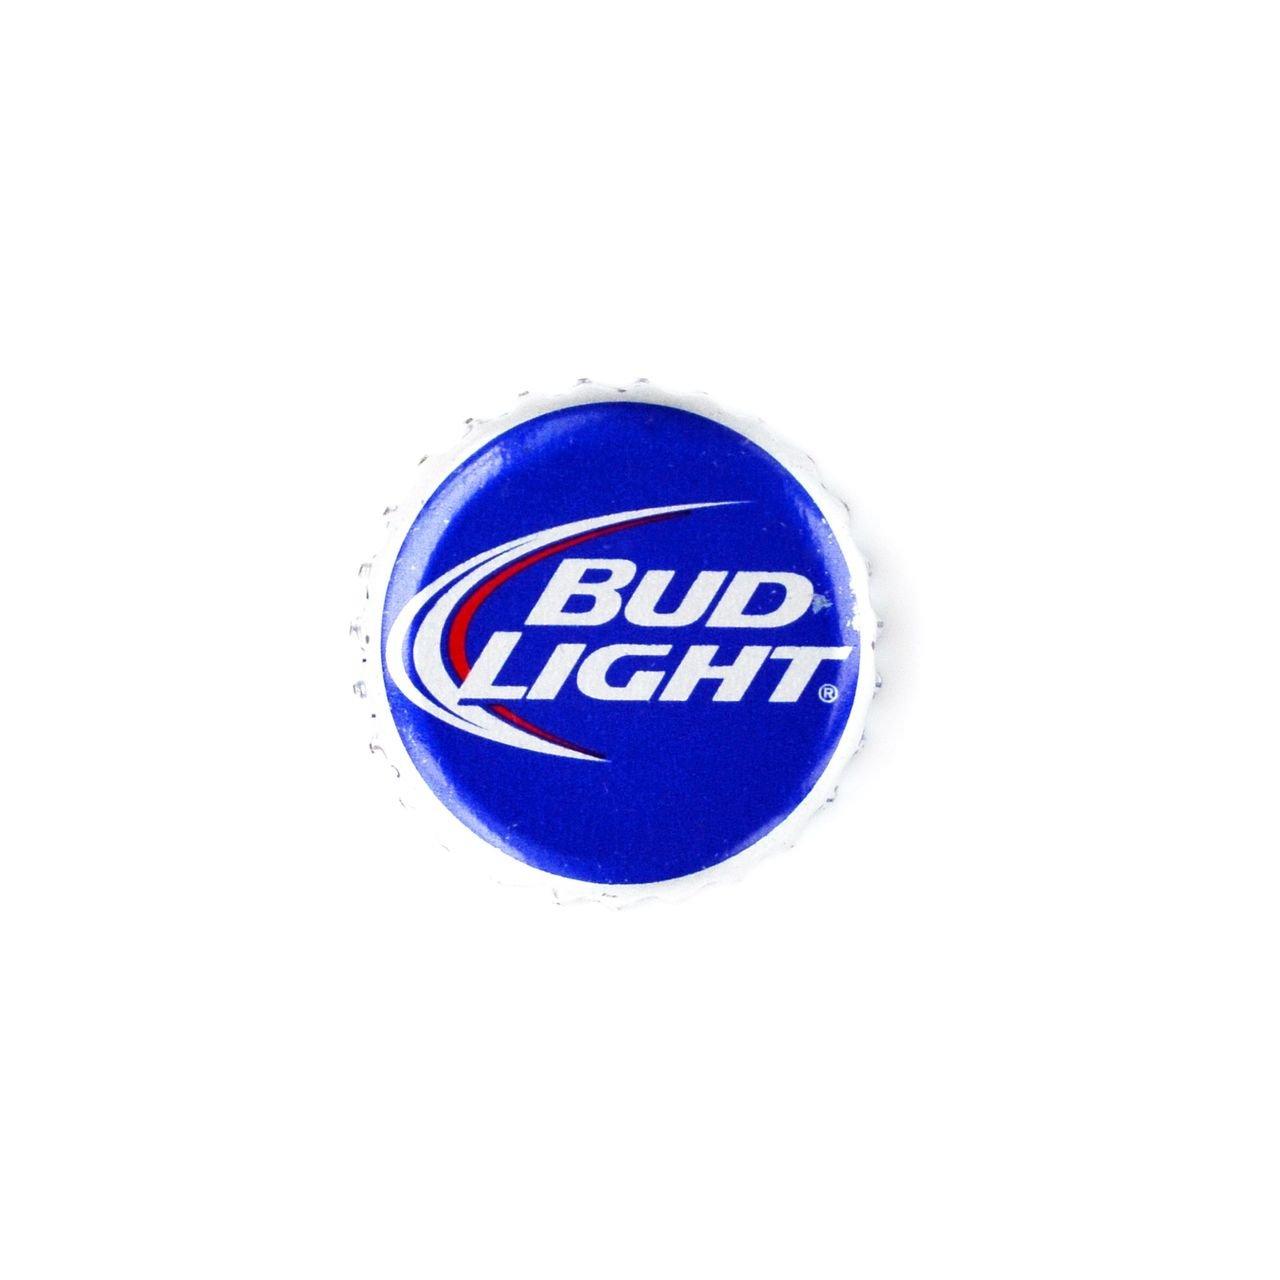 Quality Handcrafts Guaranteed Bud Light Bottle Cap Lapel Pin LP370